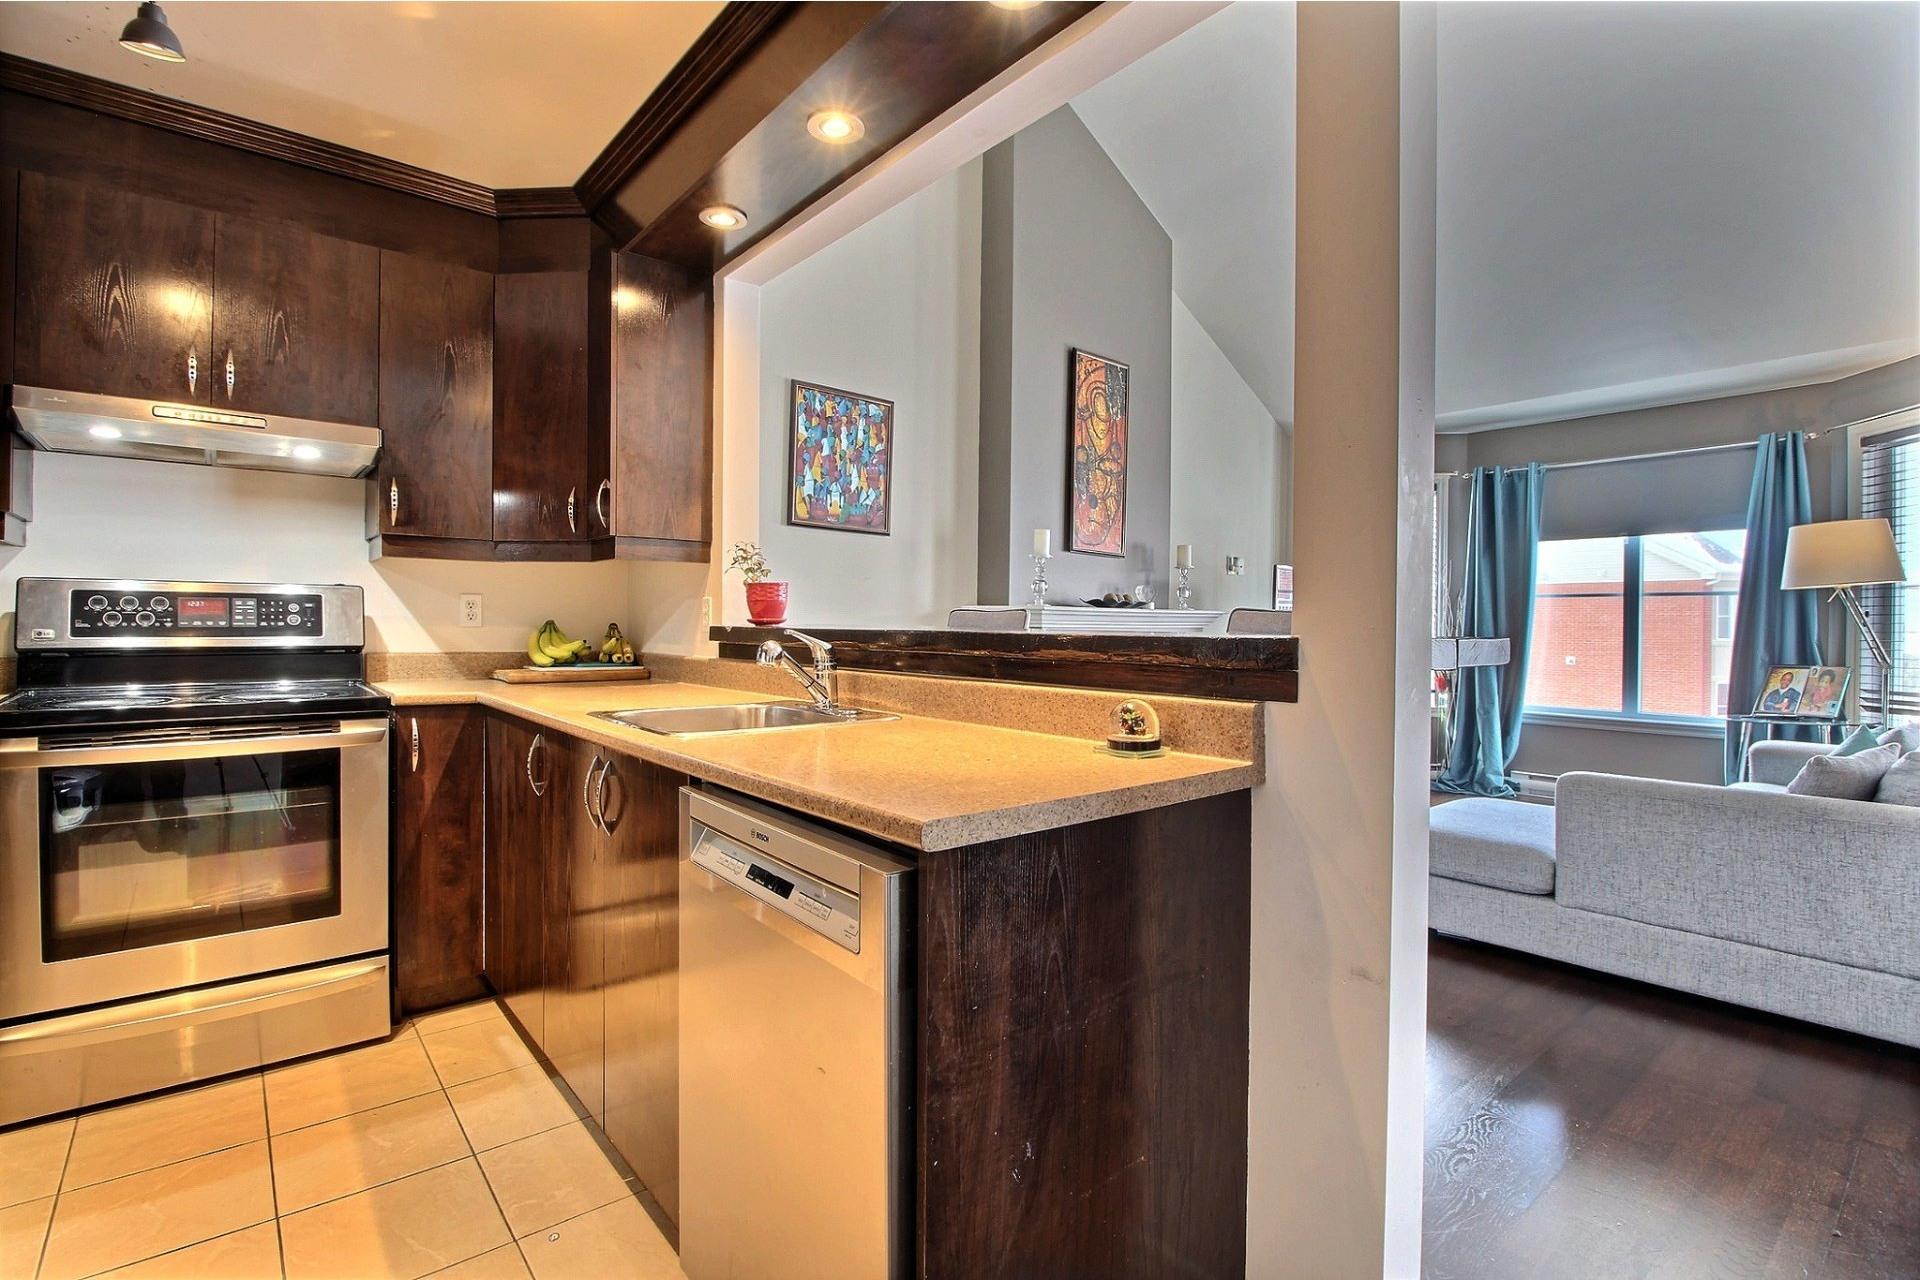 image 5 - Apartment For sale Longueuil Saint-Hubert  - 6 rooms